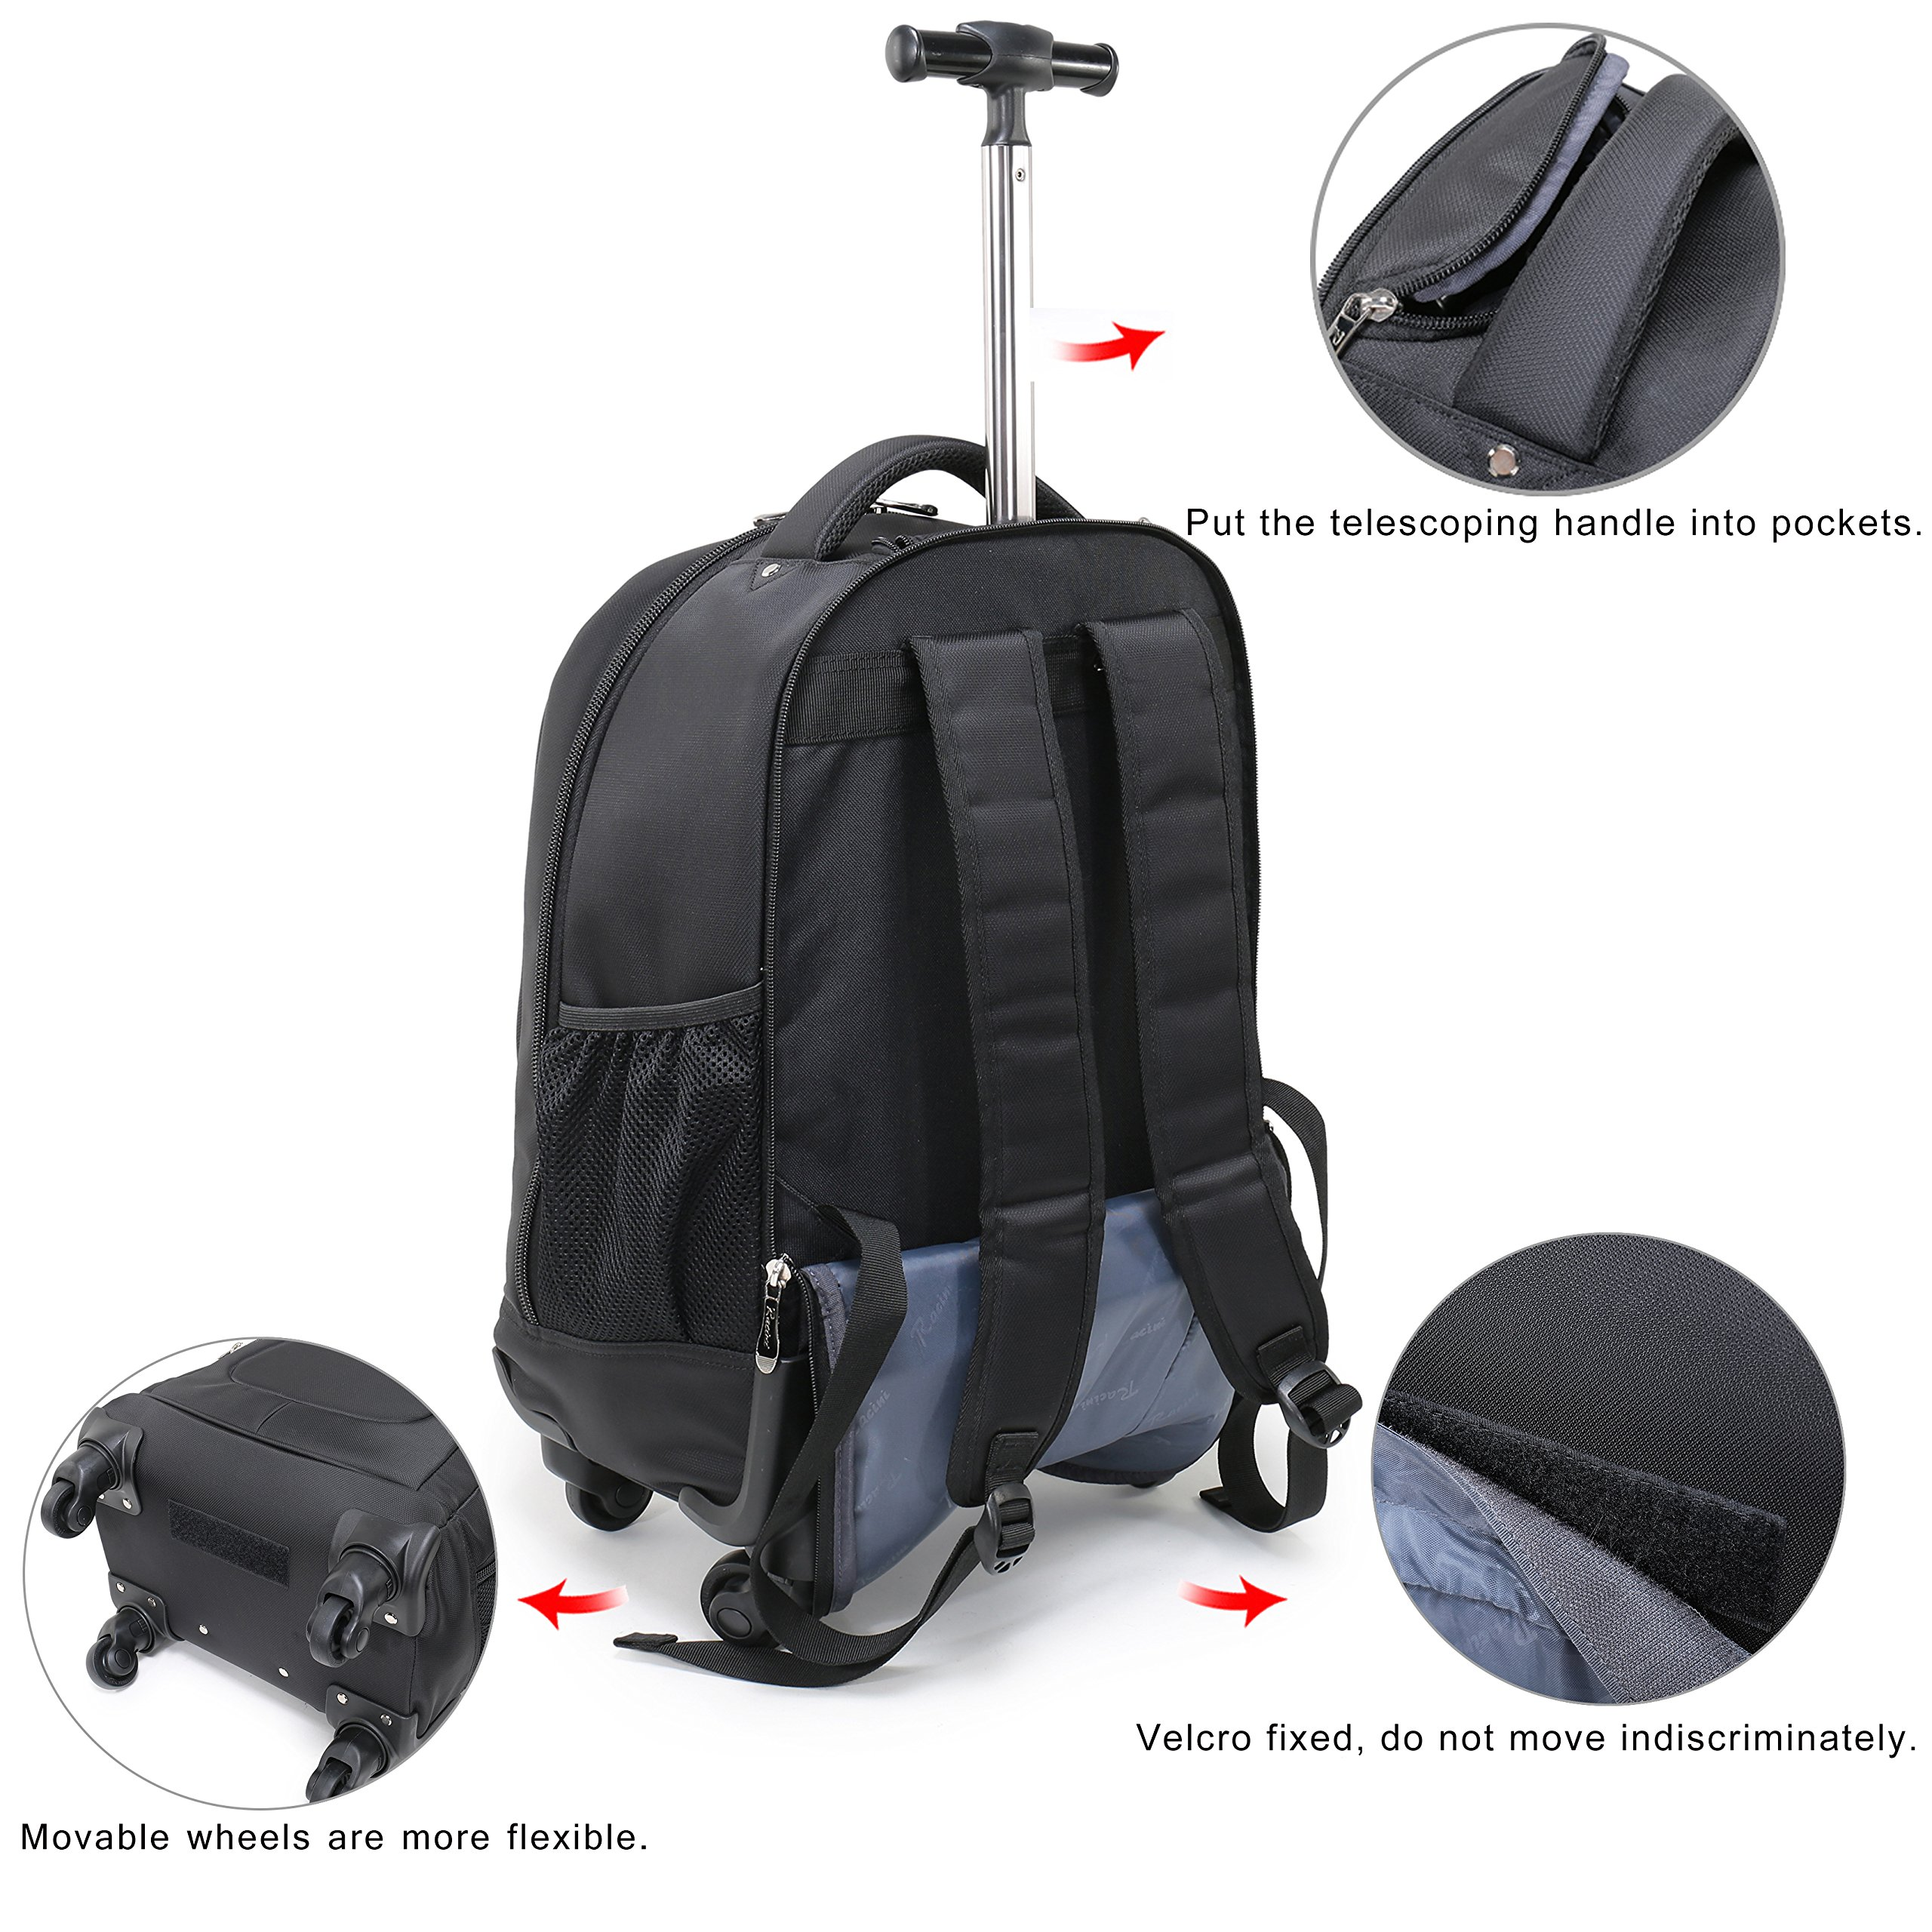 Racini Nylon Waterproof Rolling Backpack, Freewheel Travel School Wheeled Backpack, Carry-on Luggage with Anti-theft Zippers (Black) by Racini (Image #5)